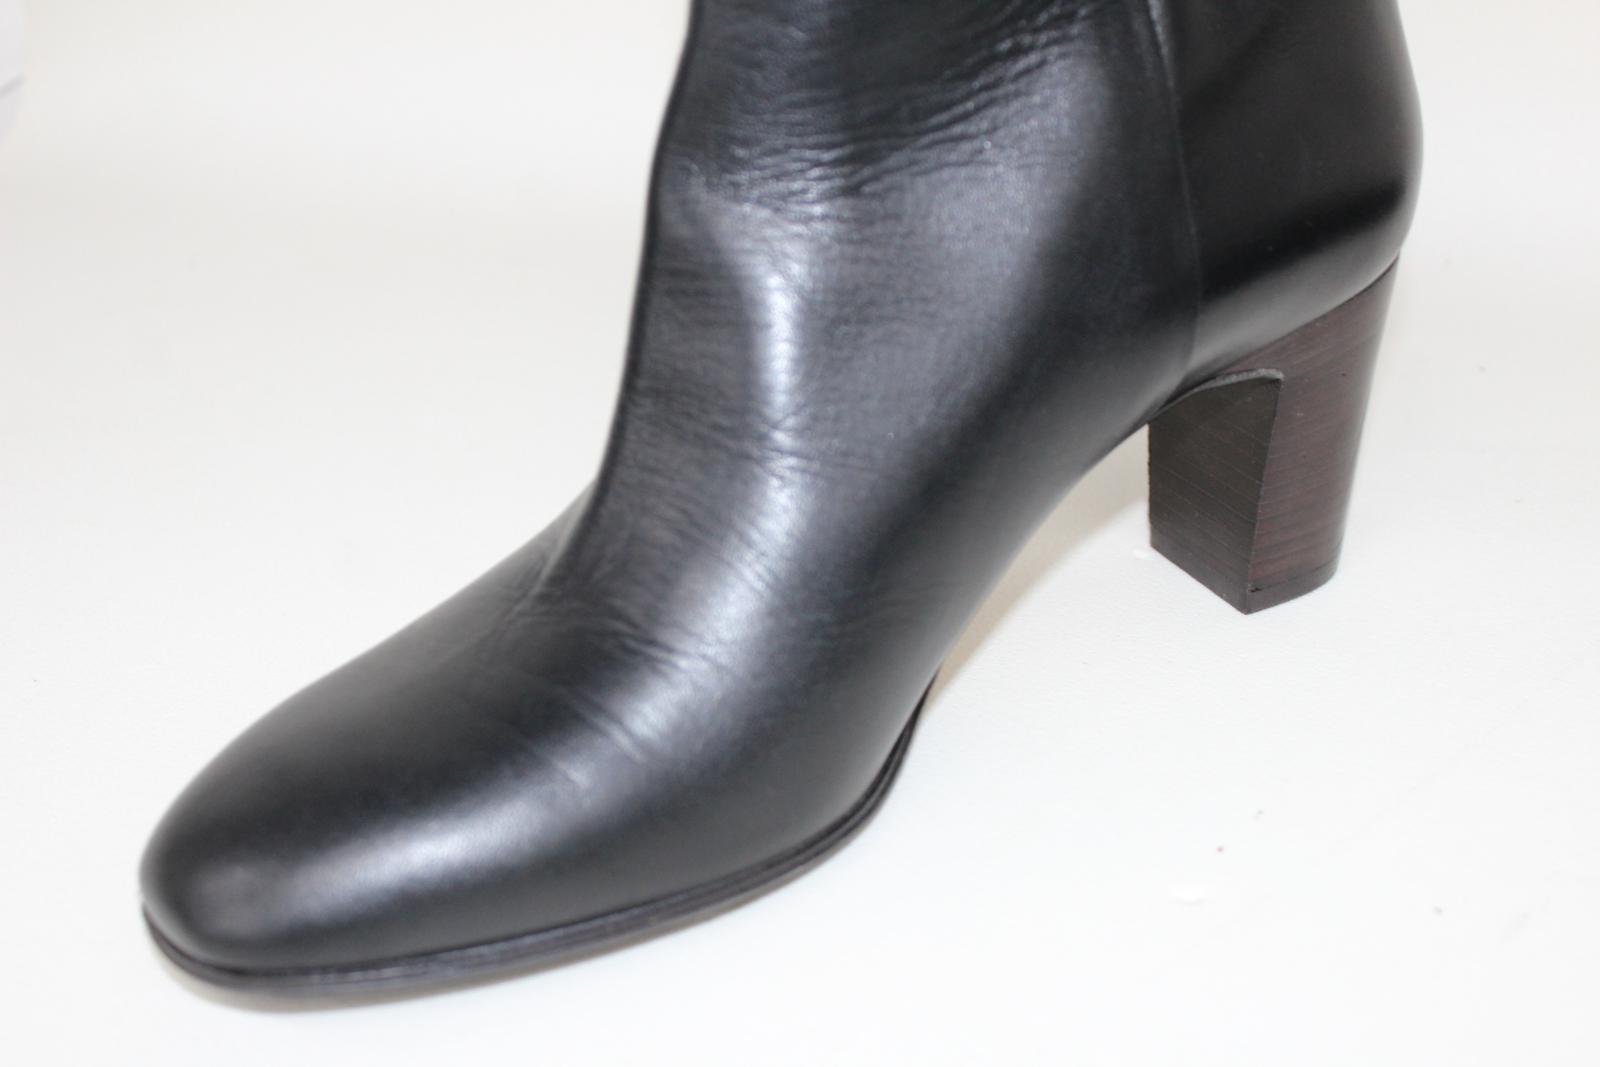 Hobbs-Senoras-Rodilla-Tacon-Maya-Cuero-Negro-Botas-De-Montar-UK8-EU41-Nuevo miniatura 11